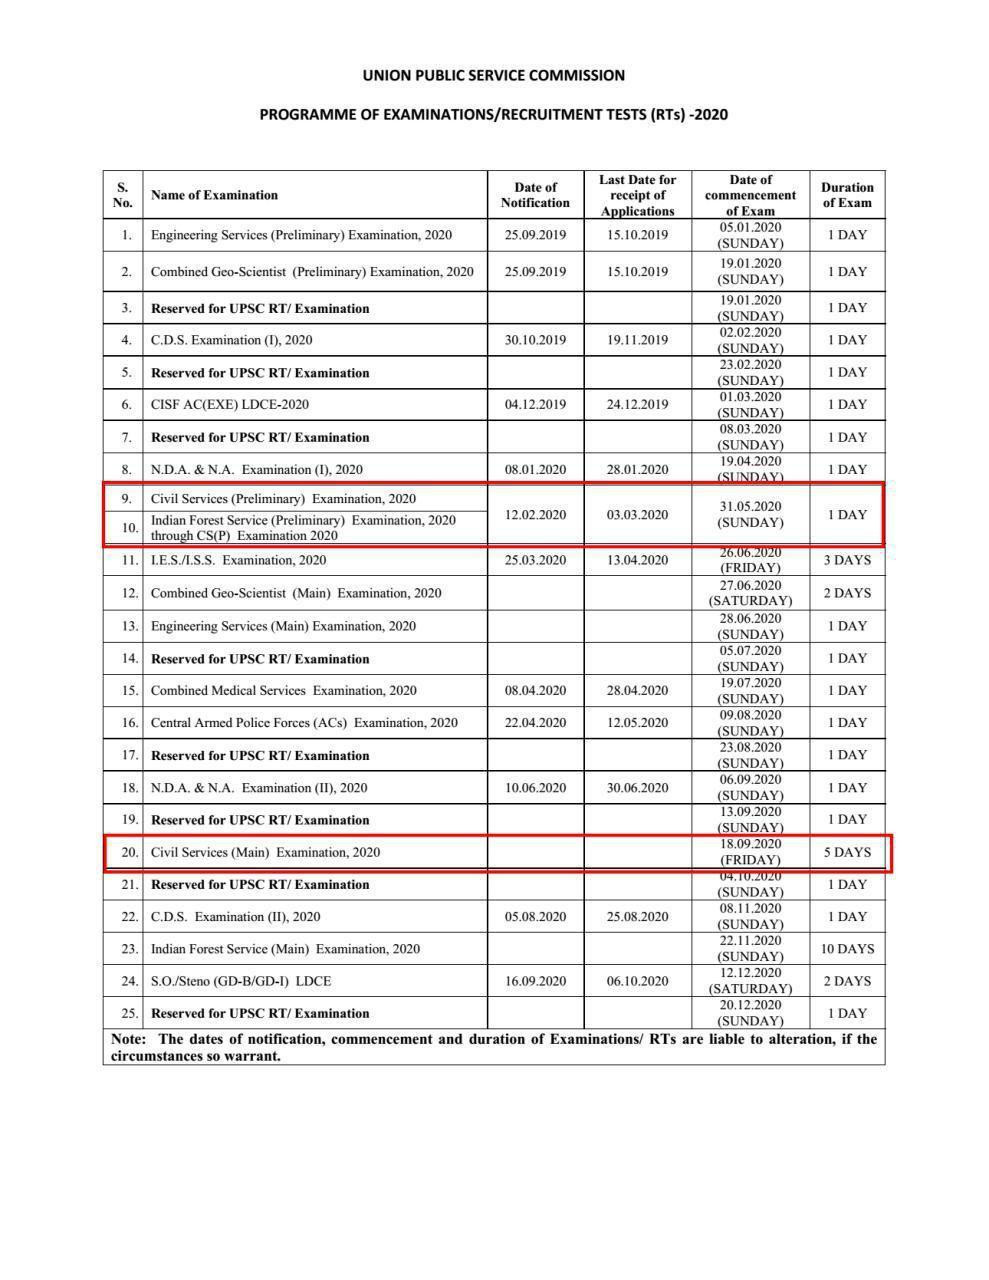 UPSC 2020 Examination Time Table